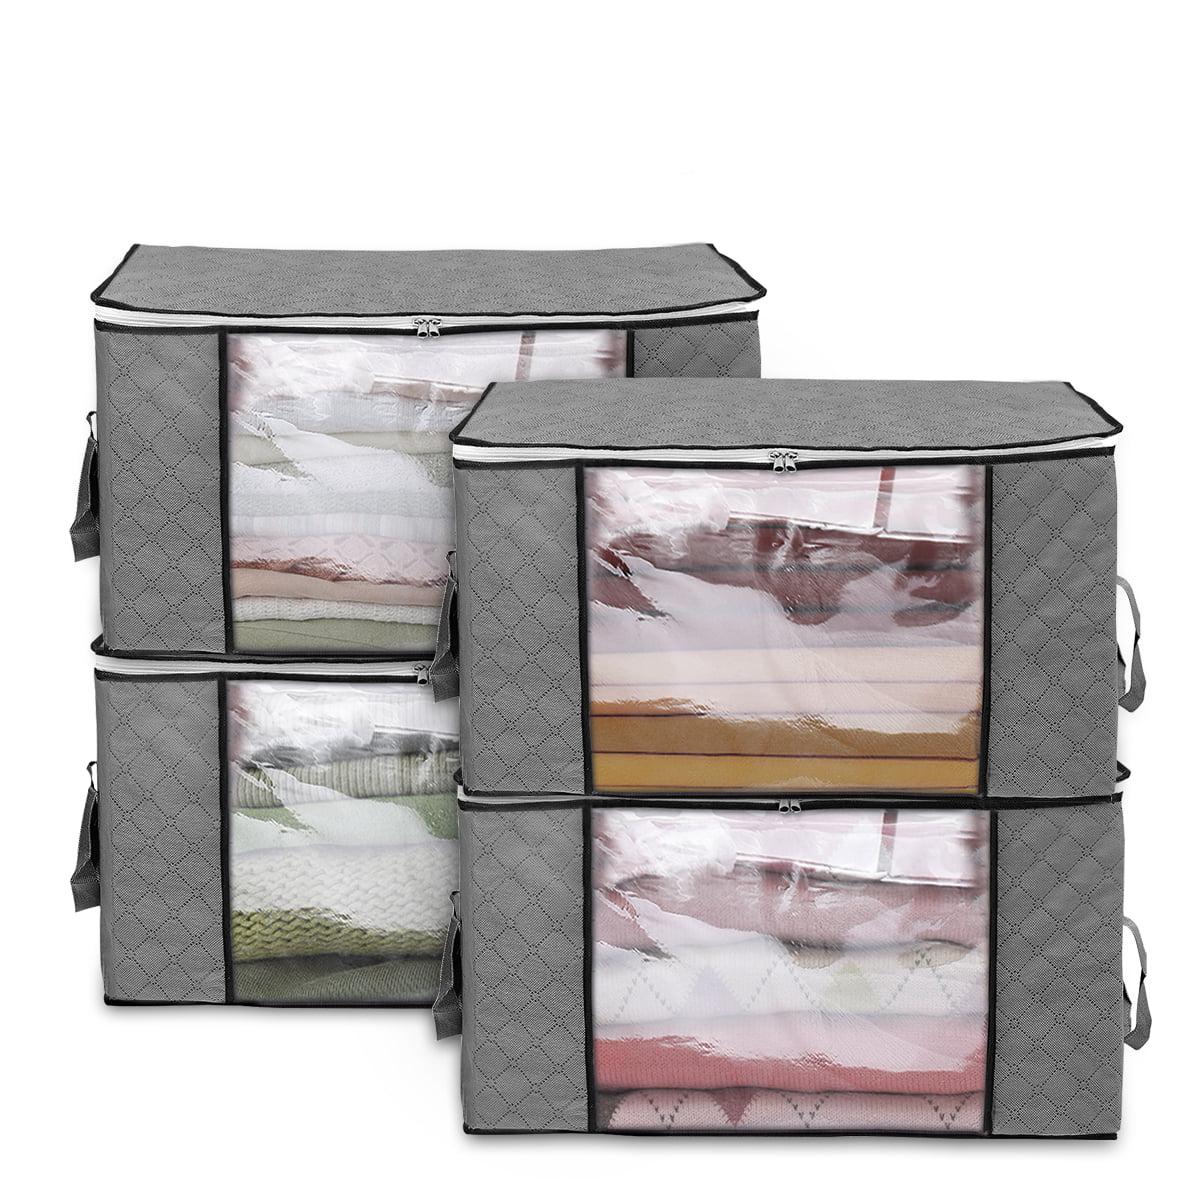 Bed In A Bag Walmart Canada